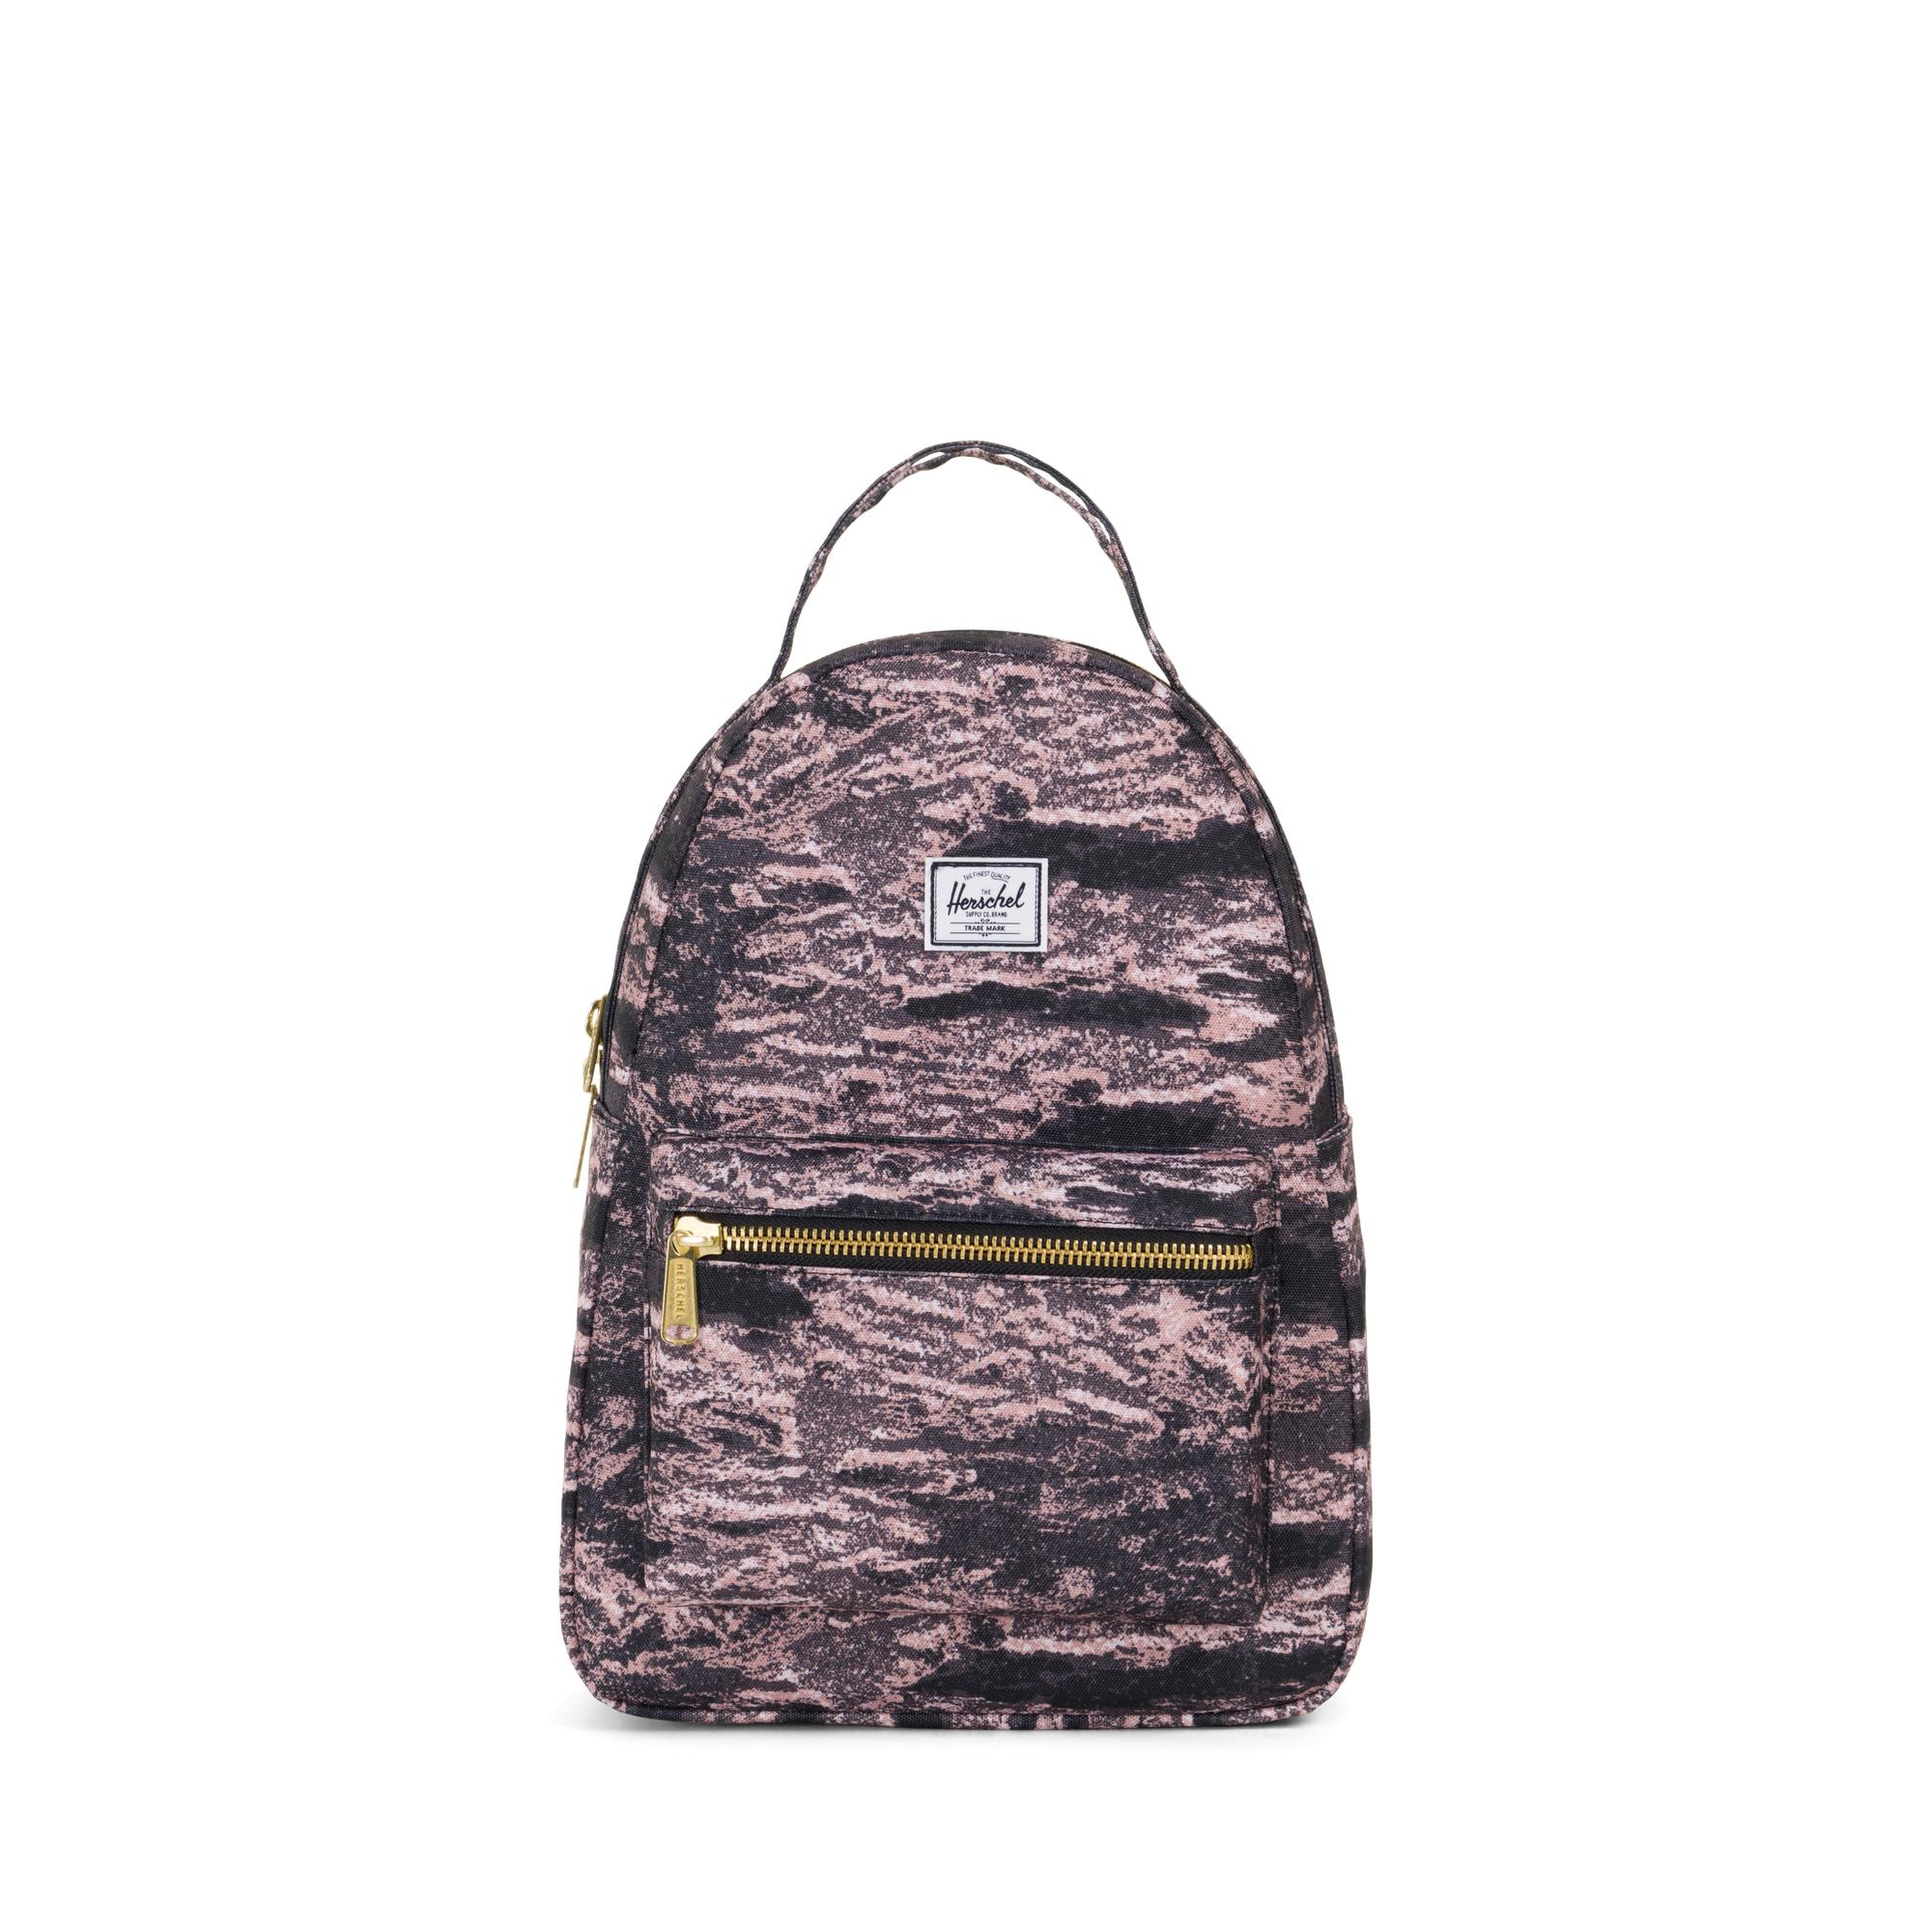 ... Nova Backpack XS Herschel Supply Company buy popular 43e21 978a3 ... dd64a6f447c5f